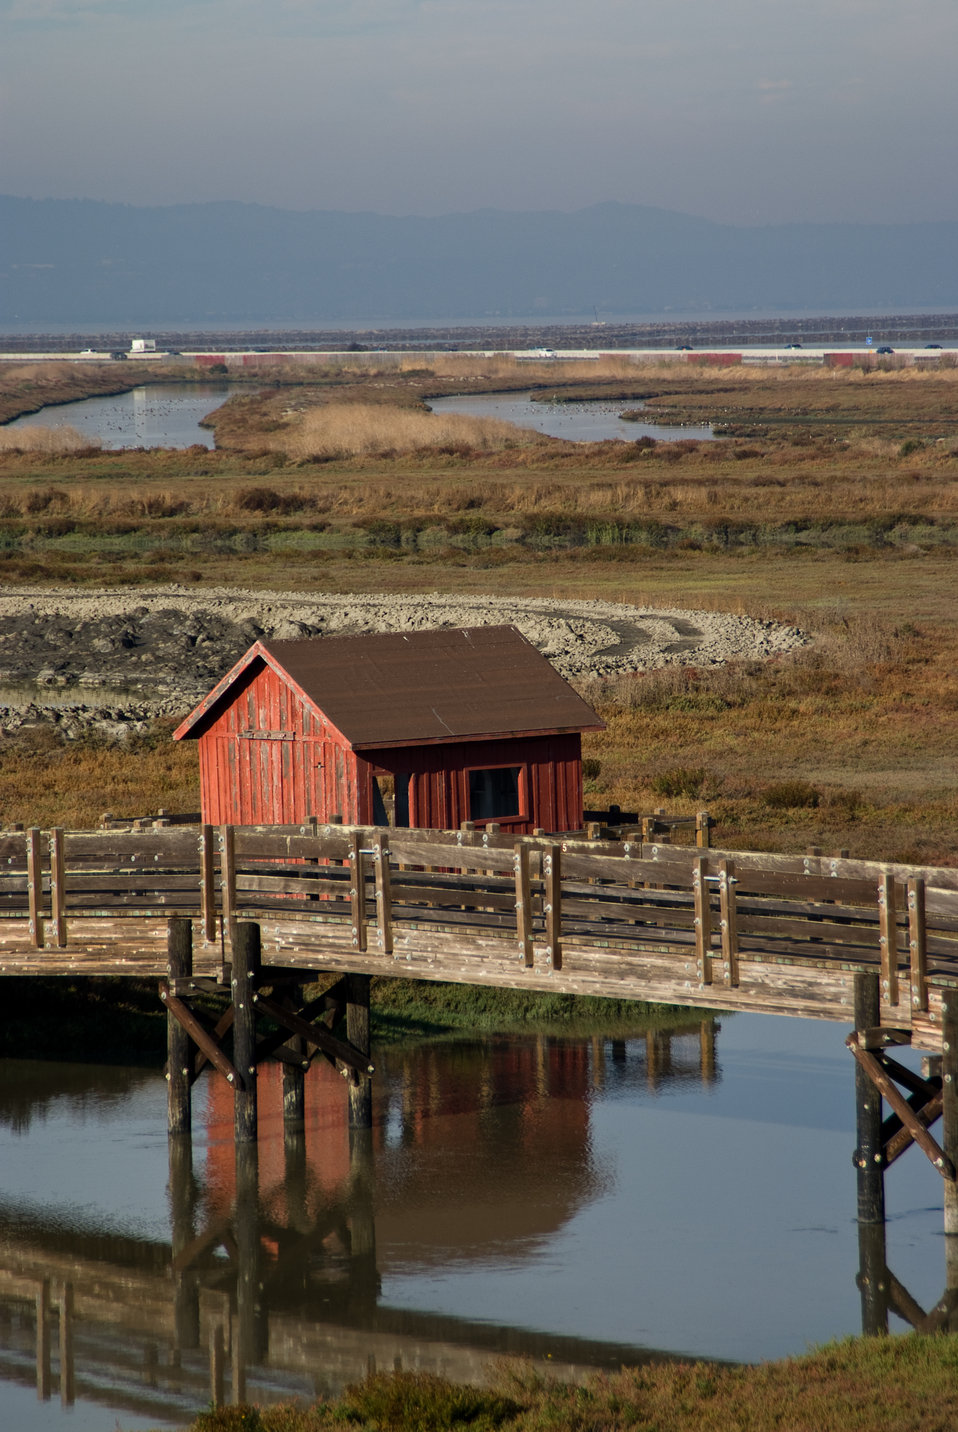 Boat house at Don Edwards San Francisco Bay National Wildlife Refuge